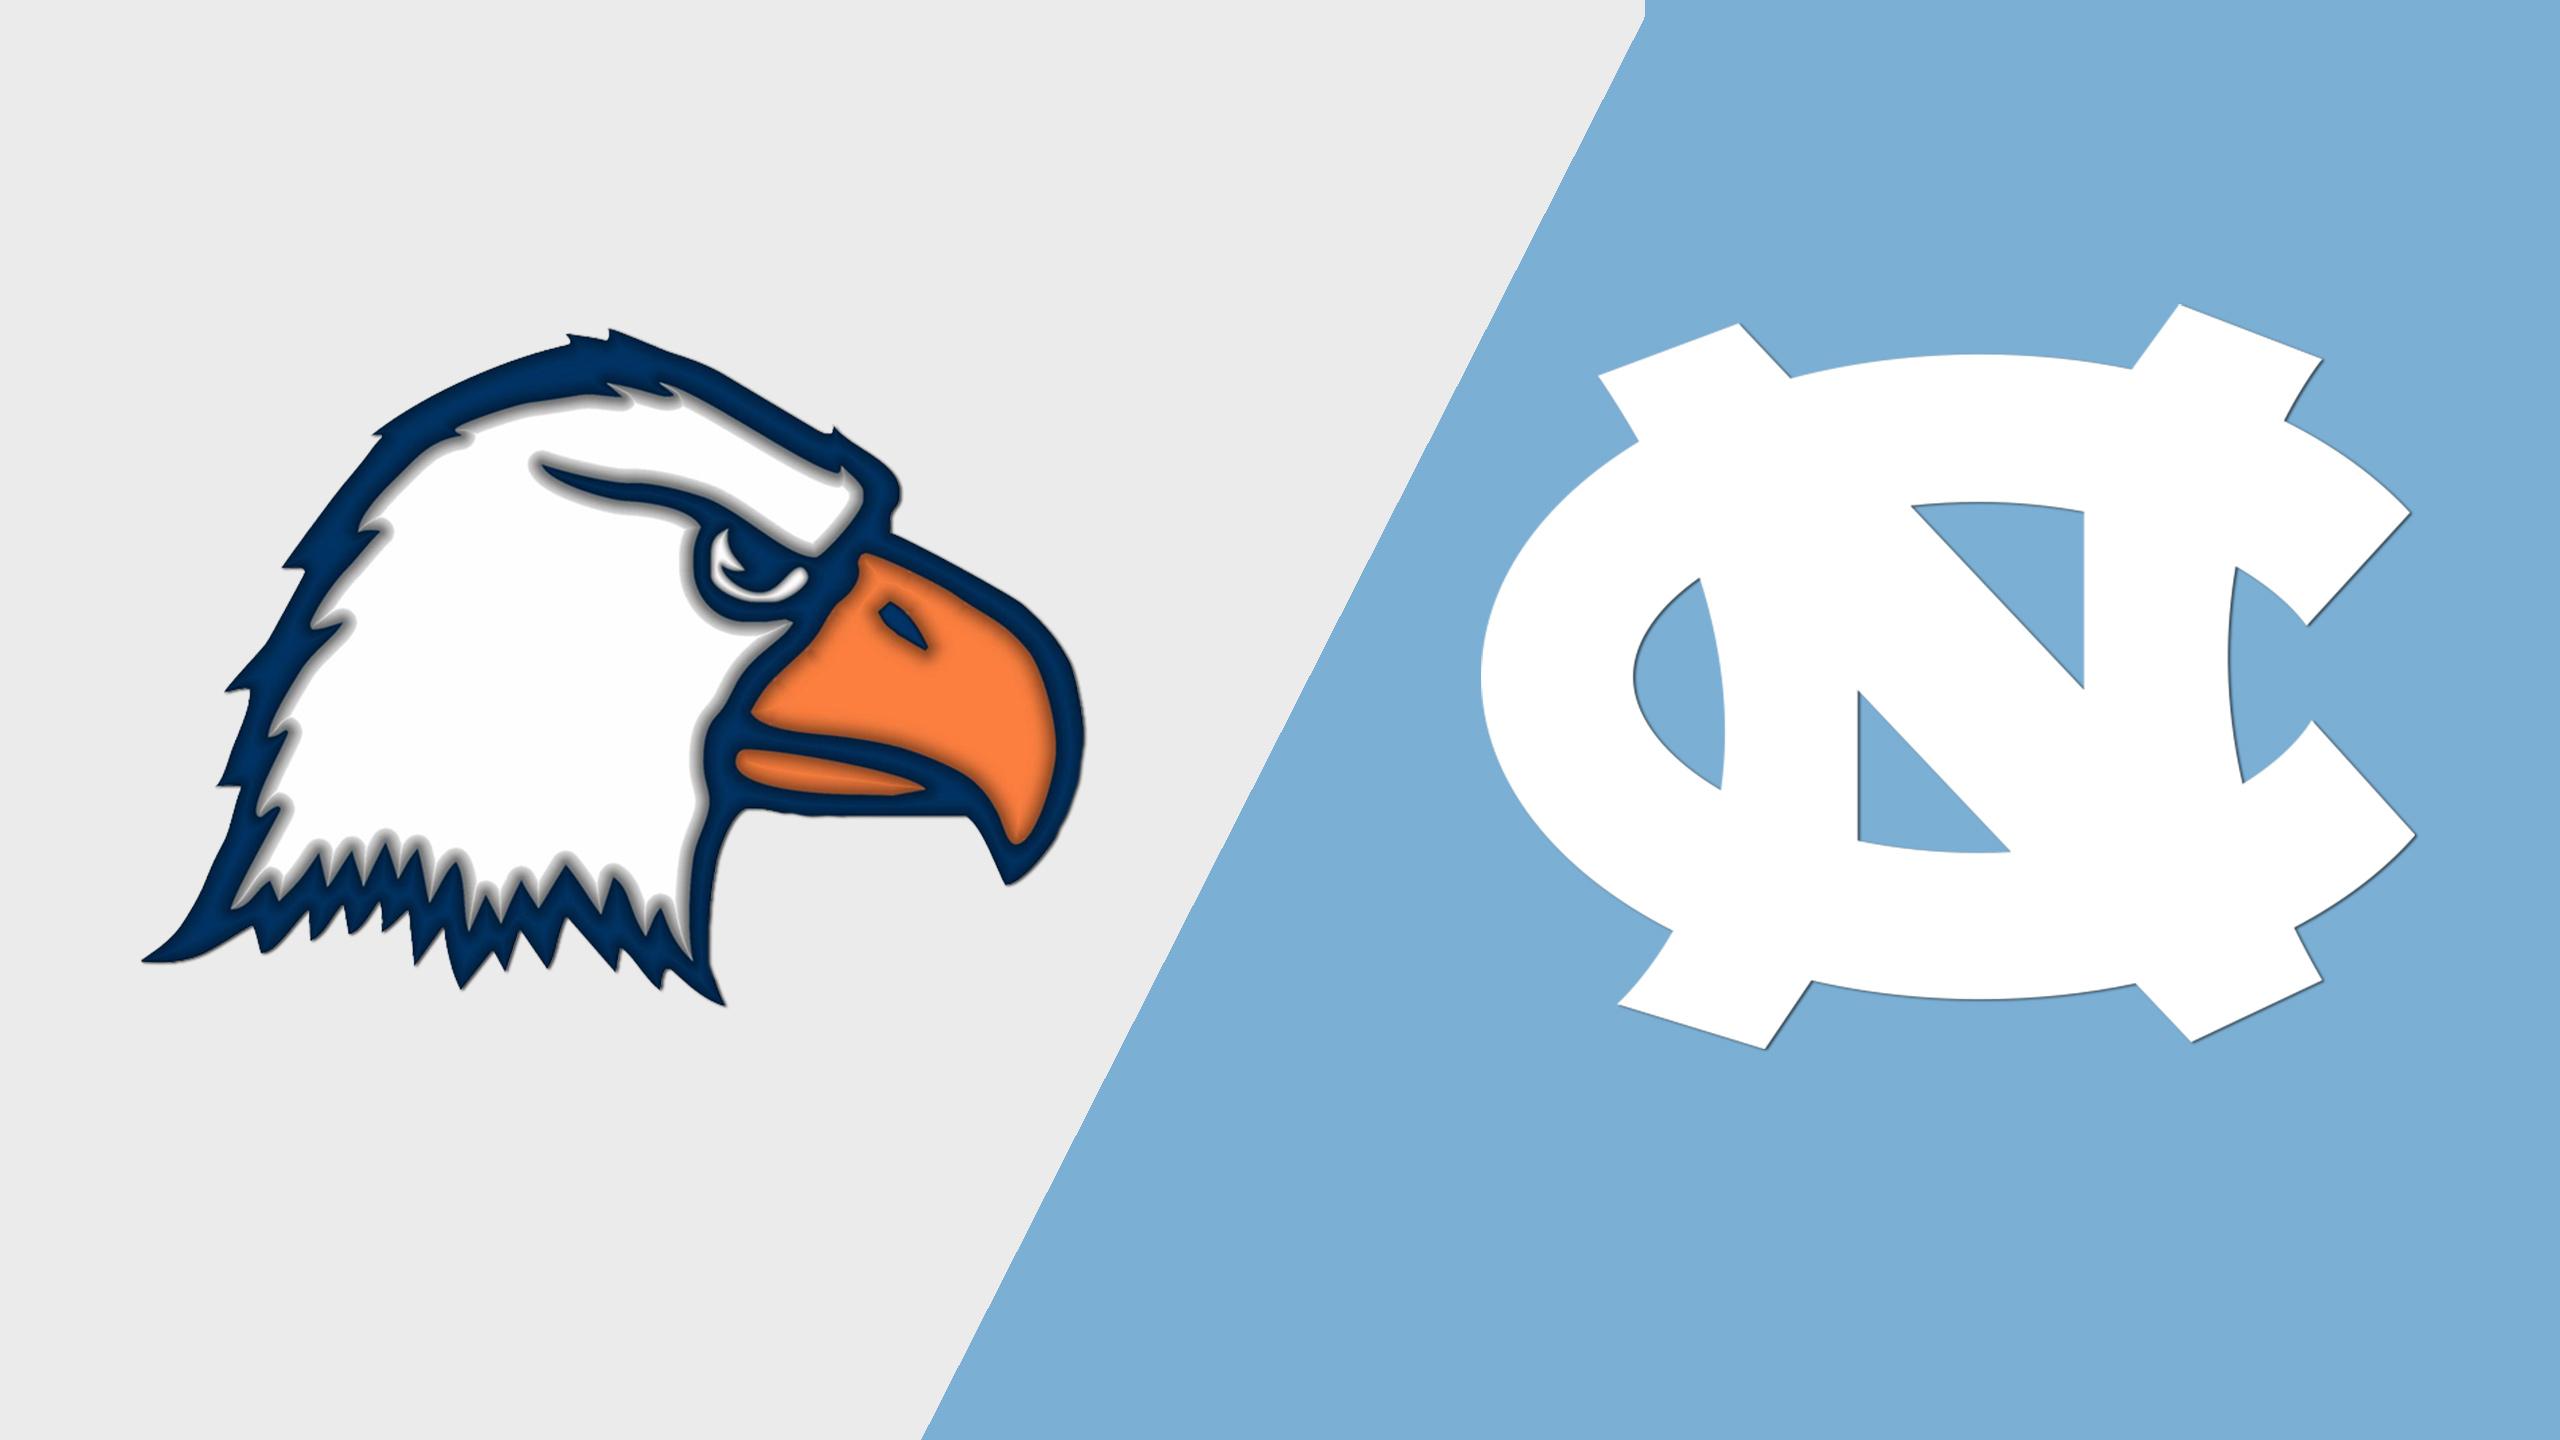 Carson-Newman vs. North Carolina (W Basketball)